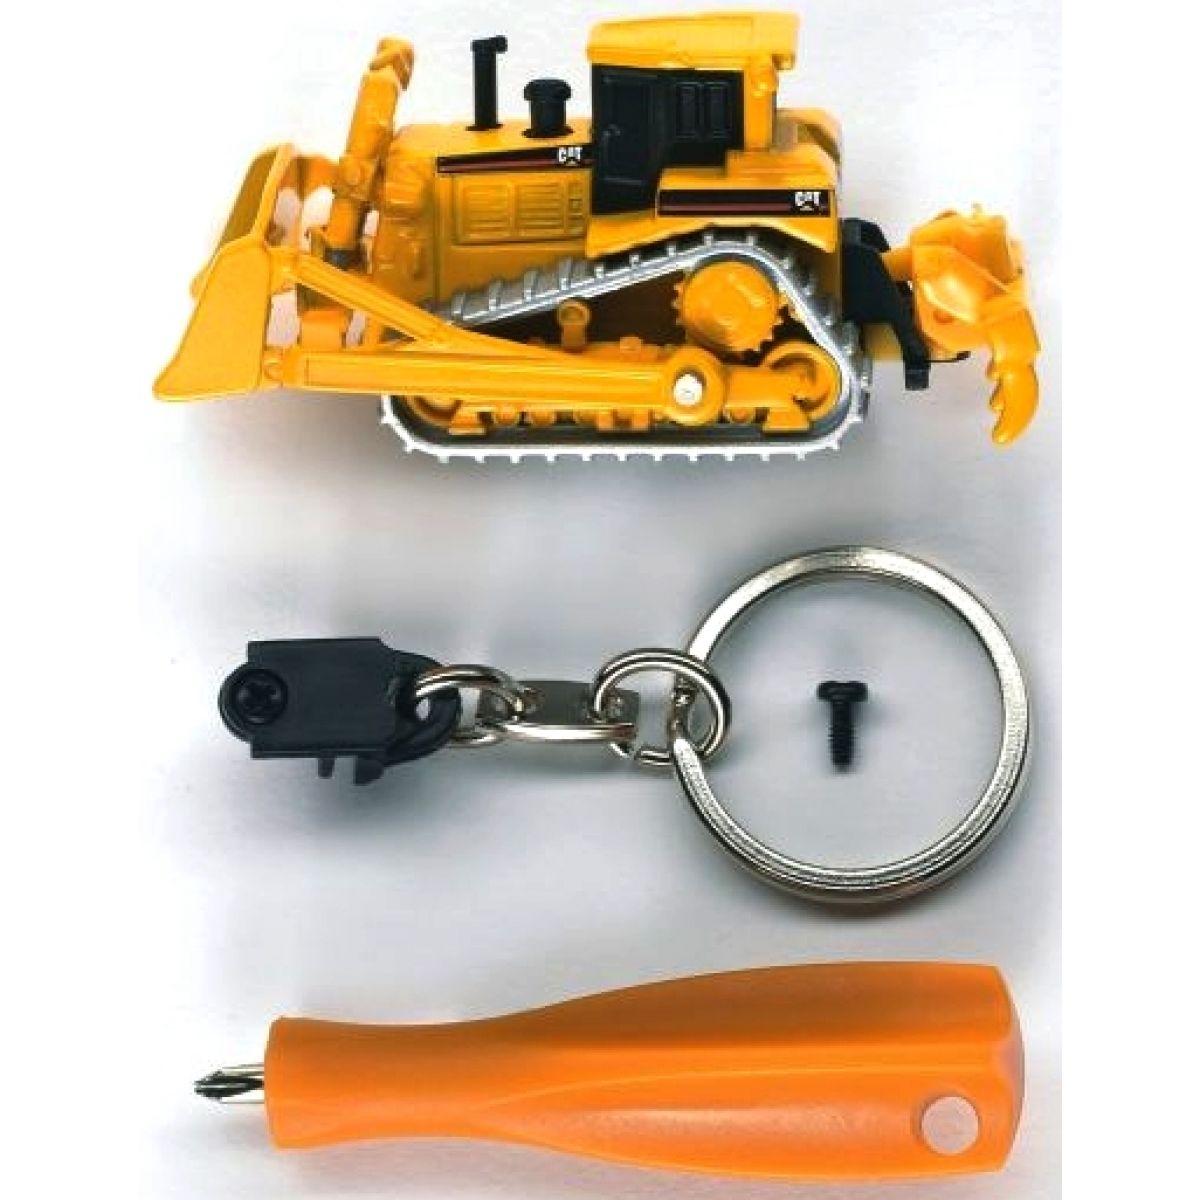 BRUDER 00500 - Přívěsek CATERPILLAR buldozer + šroubovák